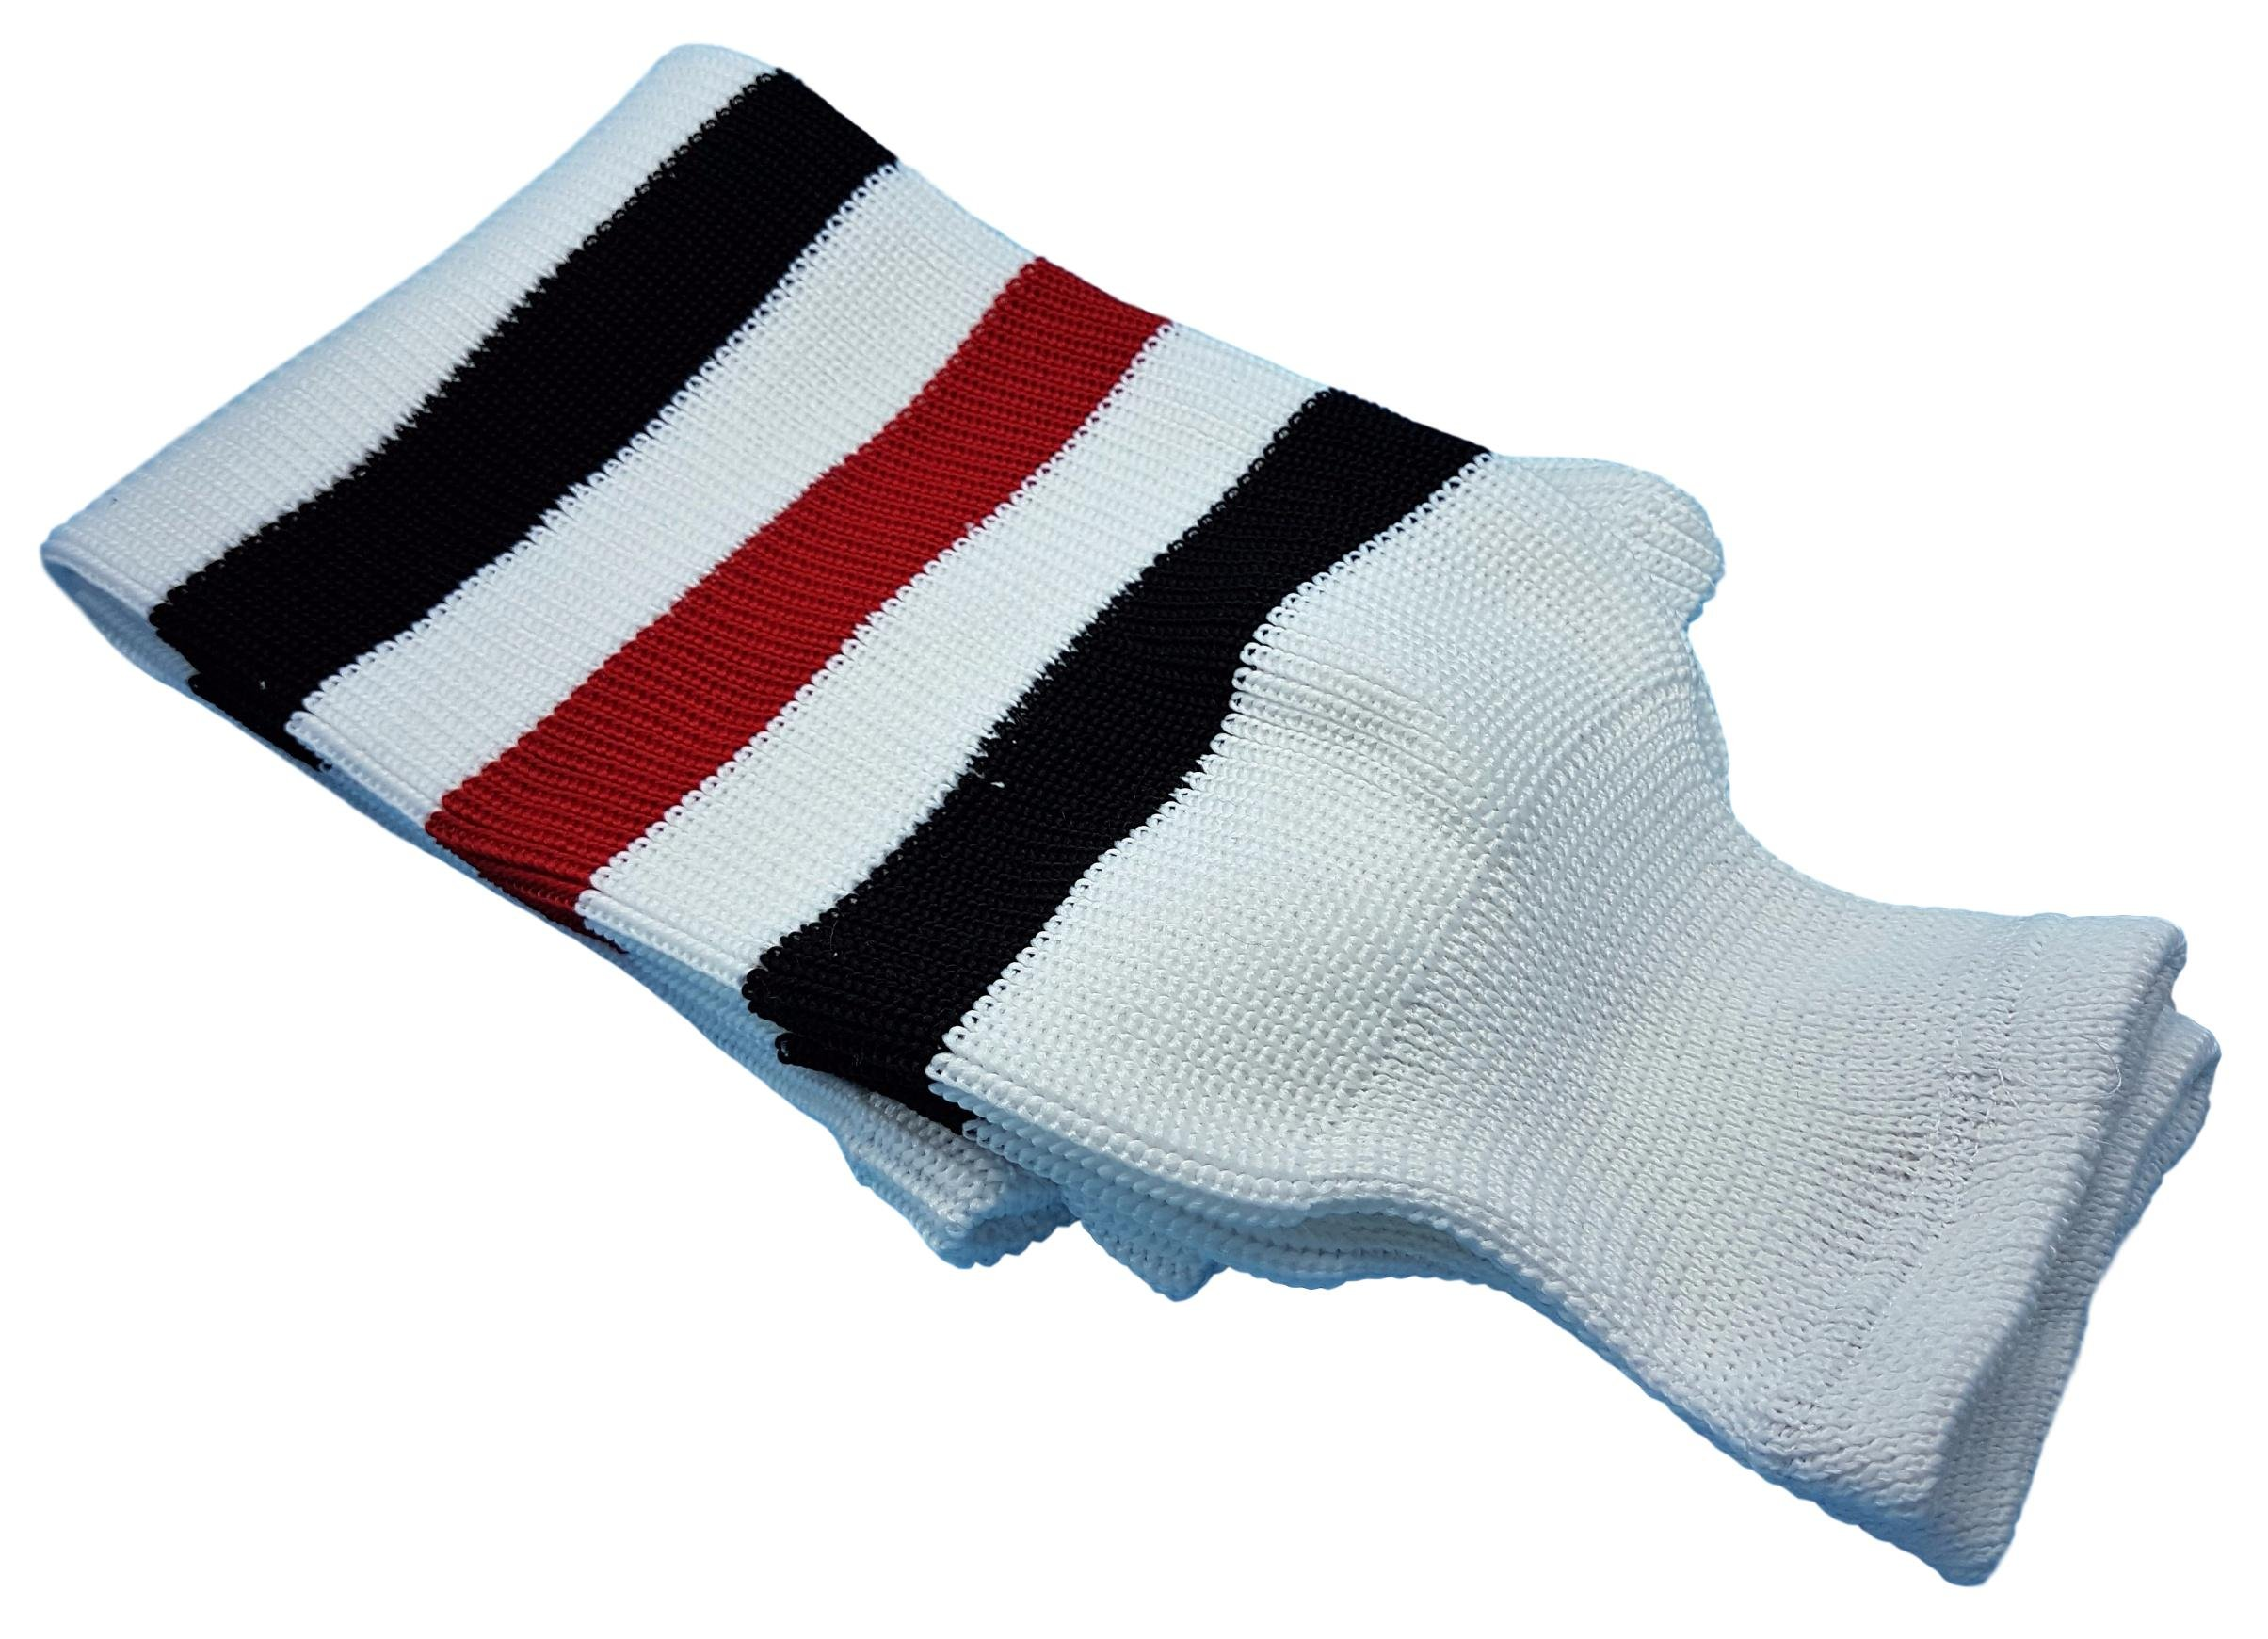 Hockey Socks Knit Made in Canada for Hockey Players (Senior 32'', 7 White w/ Red/Black)